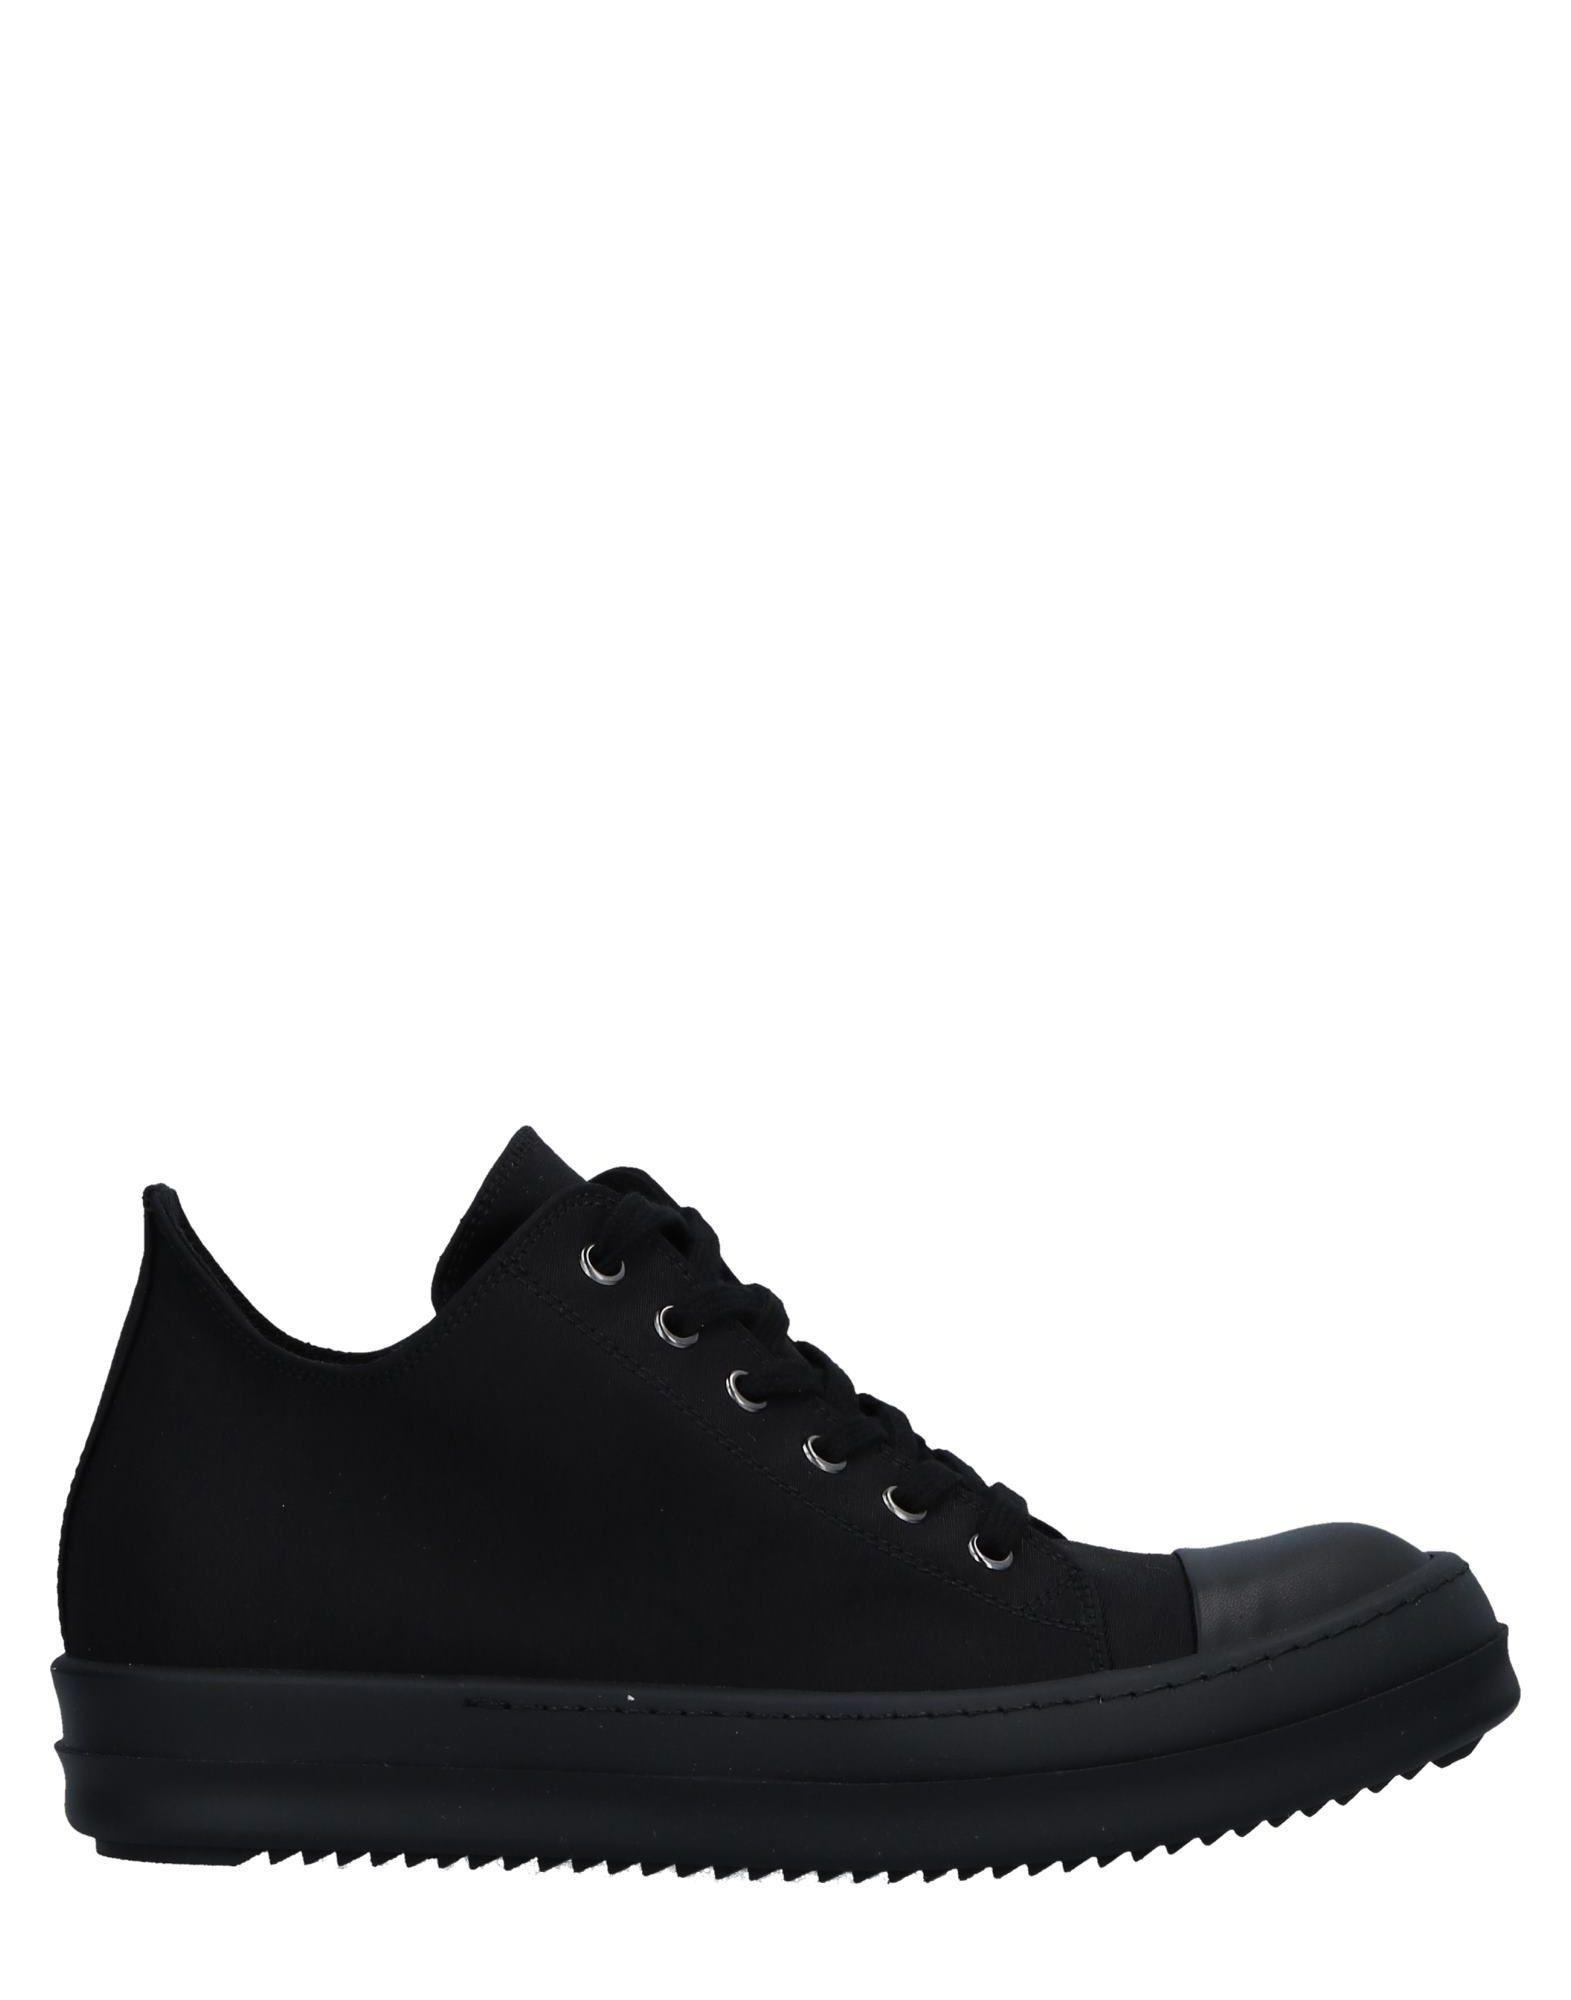 Drkshdw By Rick Owens aussehende Sneakers Damen  11513750CFGut aussehende Owens strapazierfähige Schuhe 8deee9